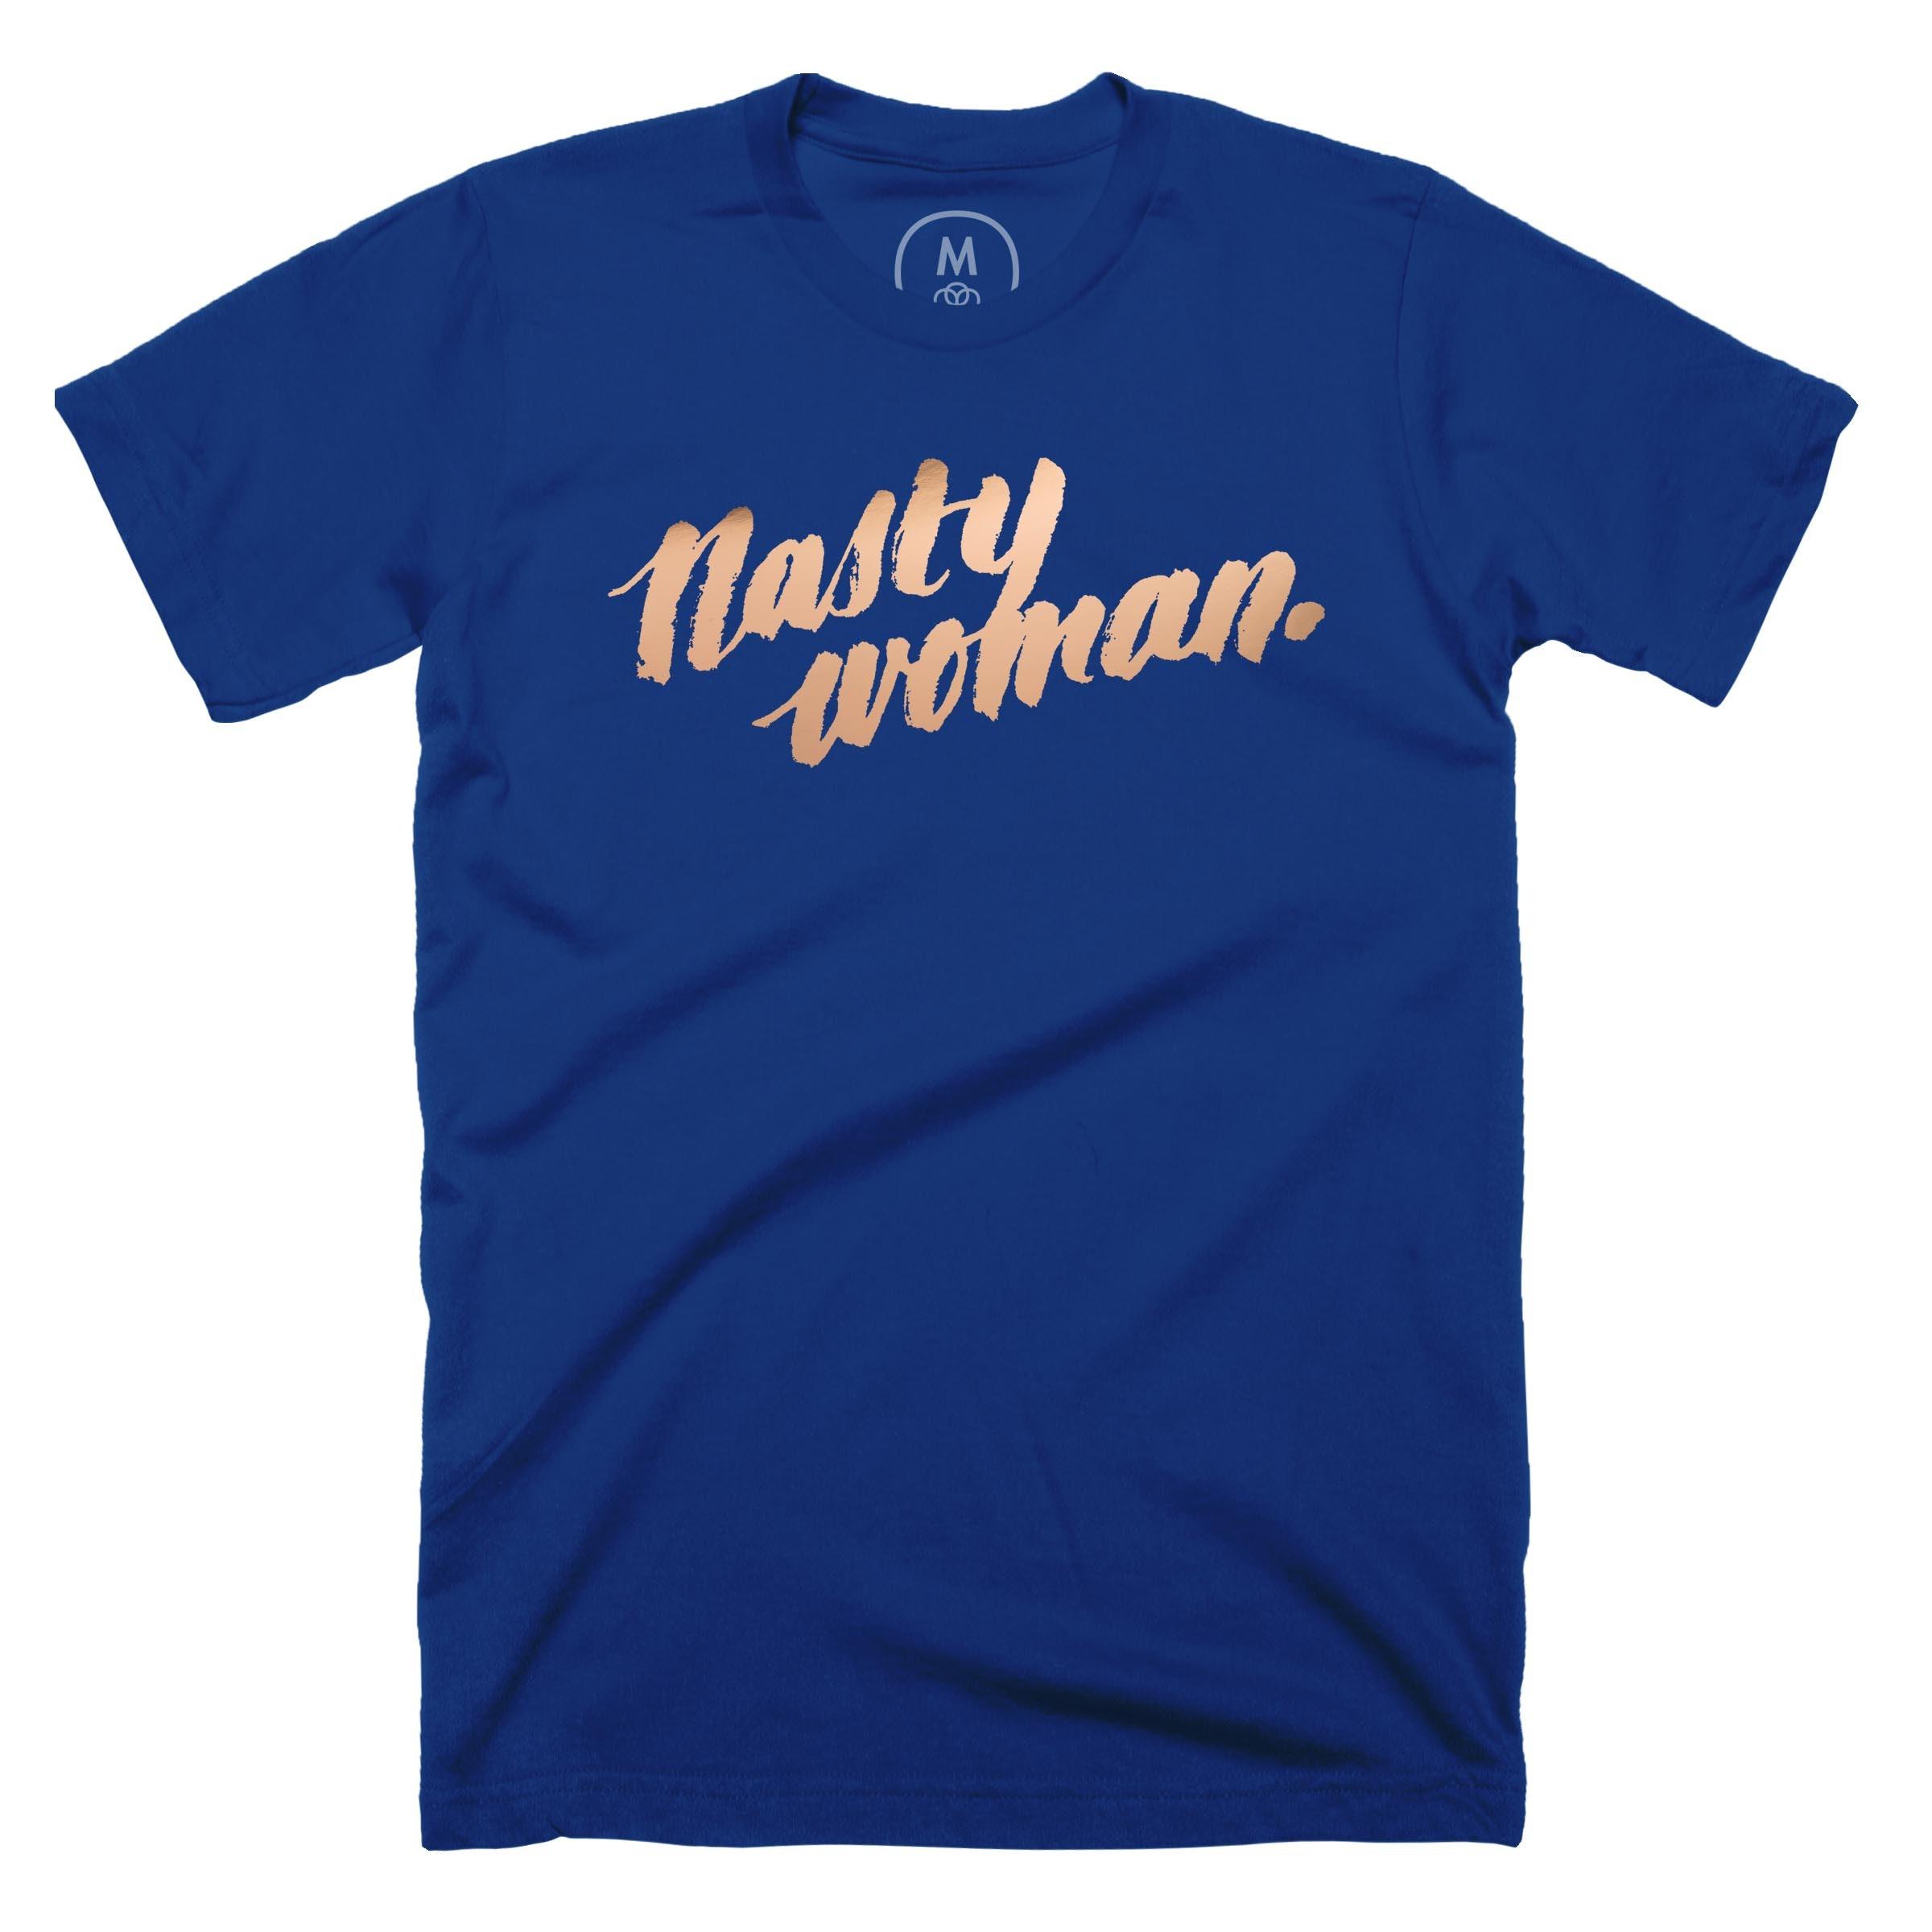 Nastee Royal (Men's)